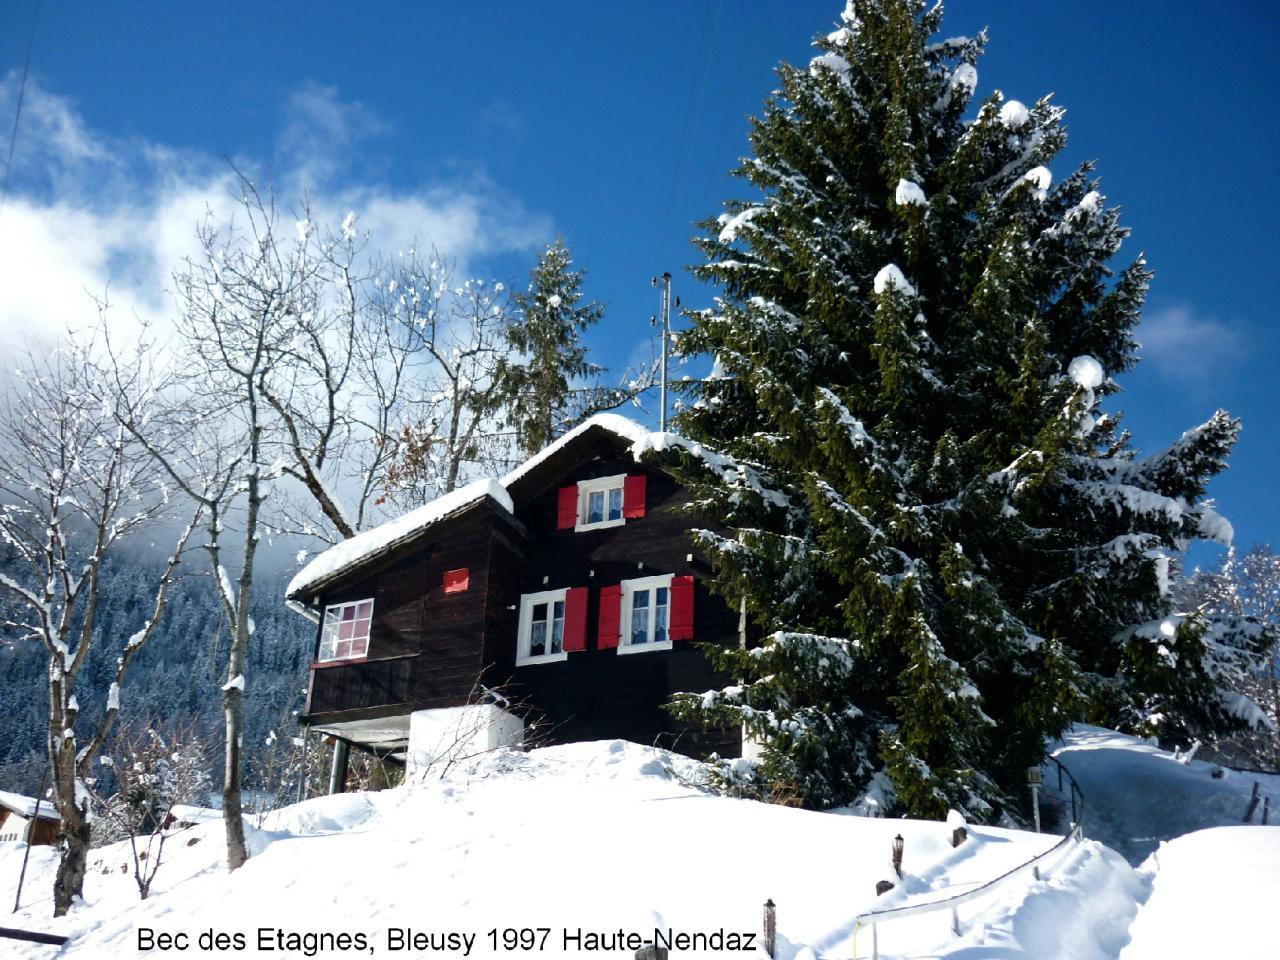 Ferien in den walliser Alpen (Schweiz)